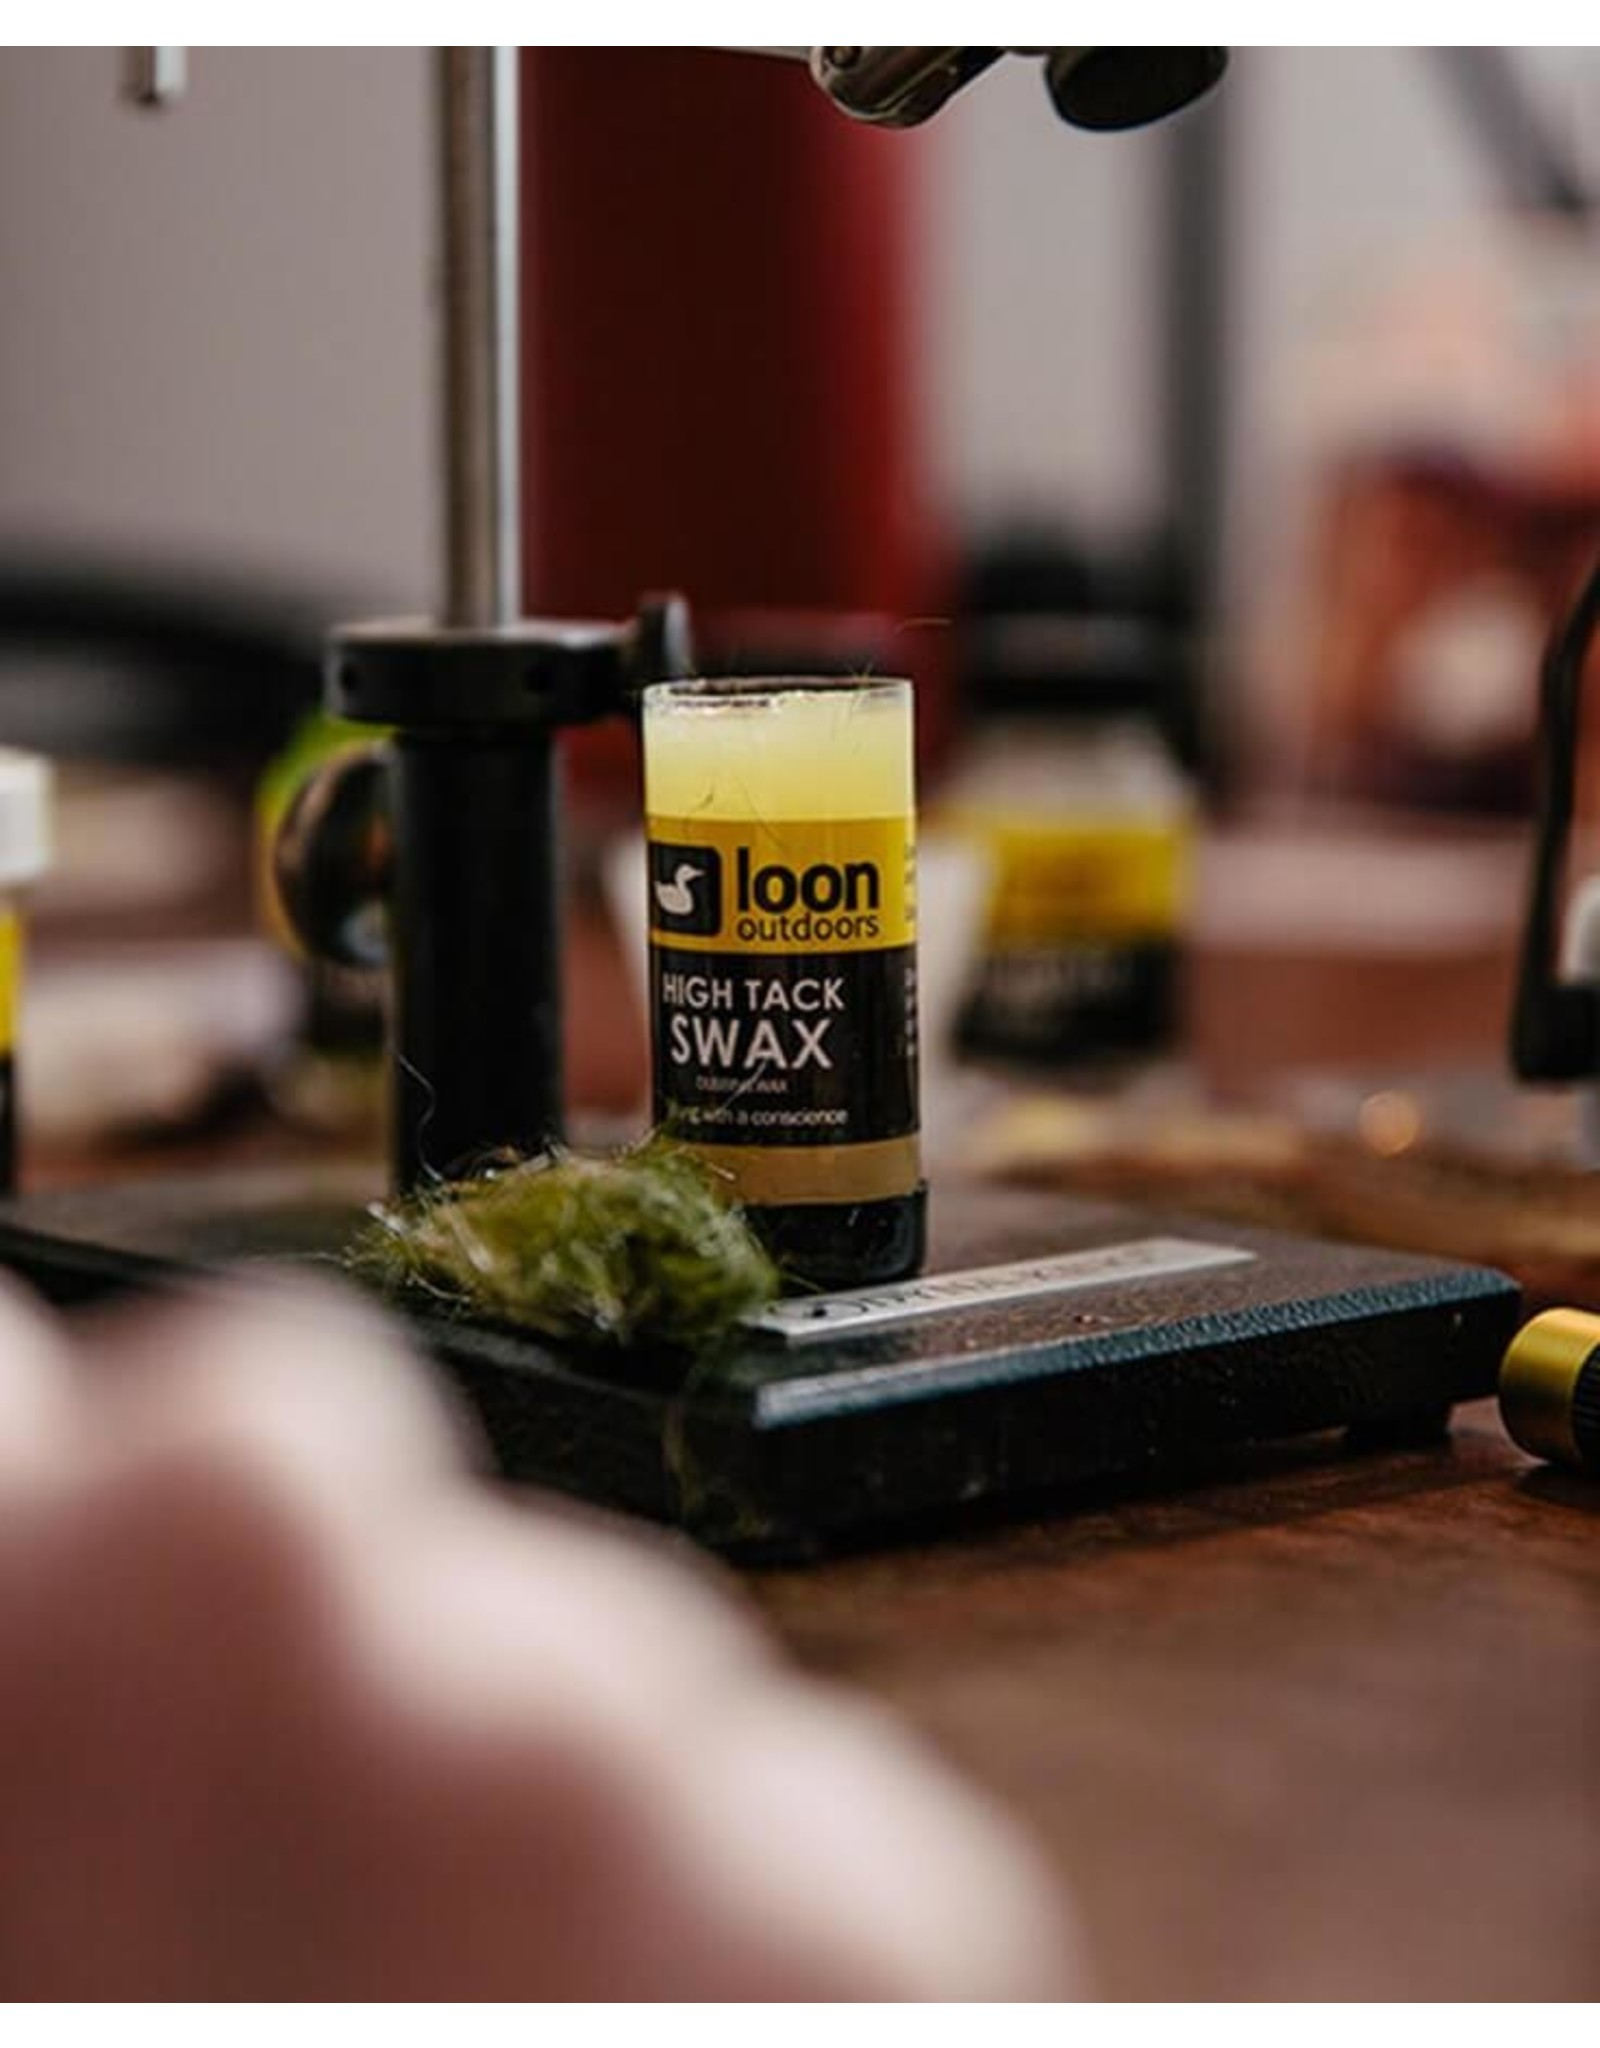 Loon Outdoors Loon - High Tack Swax